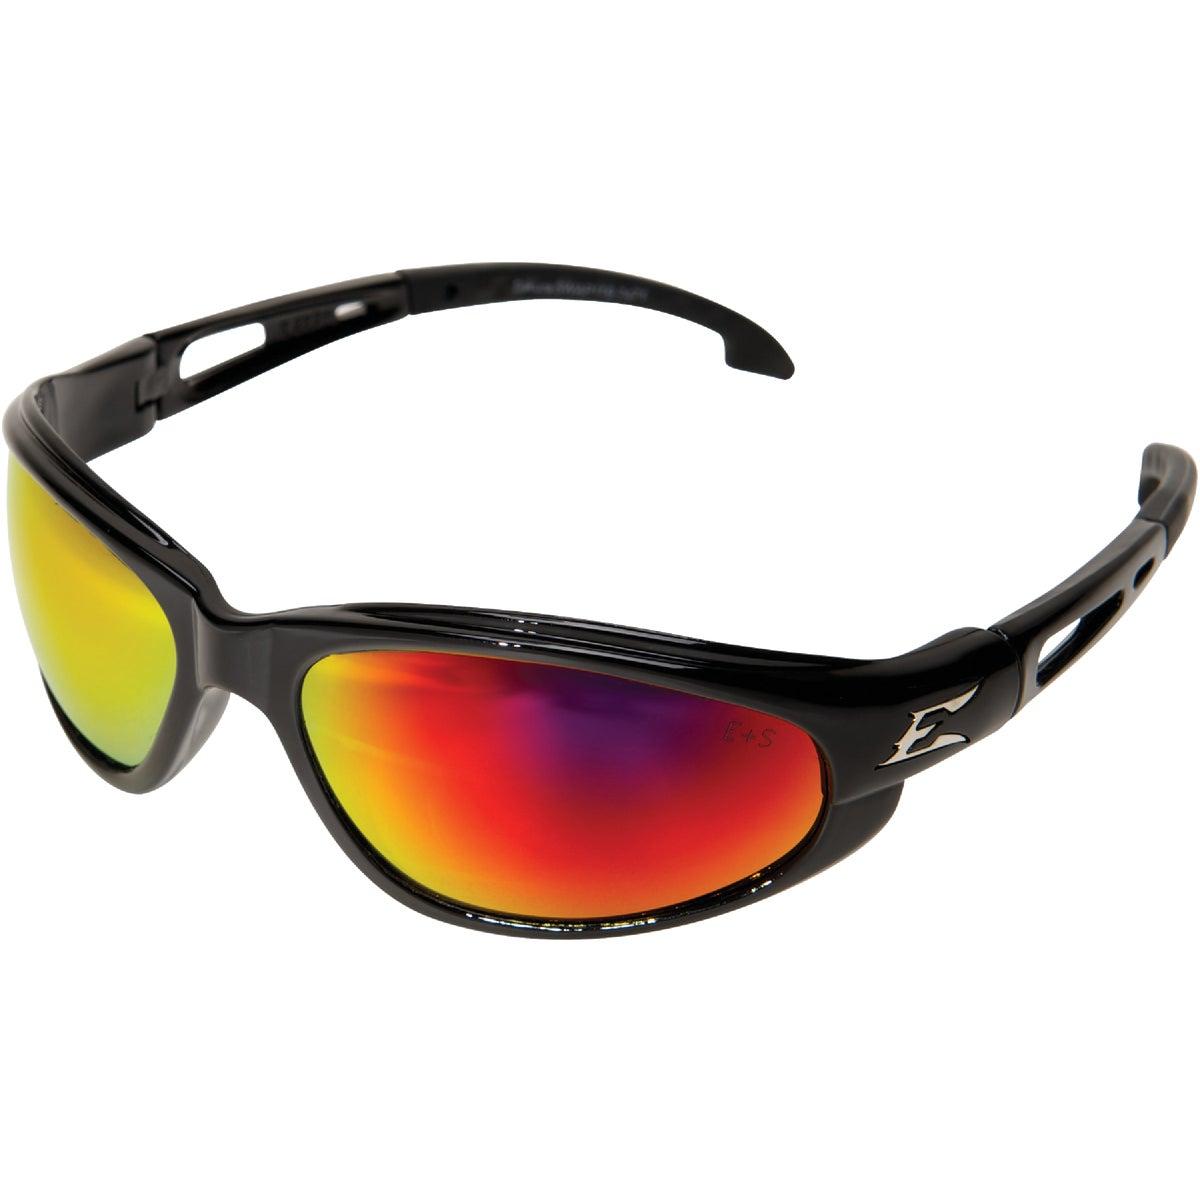 Edge Dakura Safety Glasses